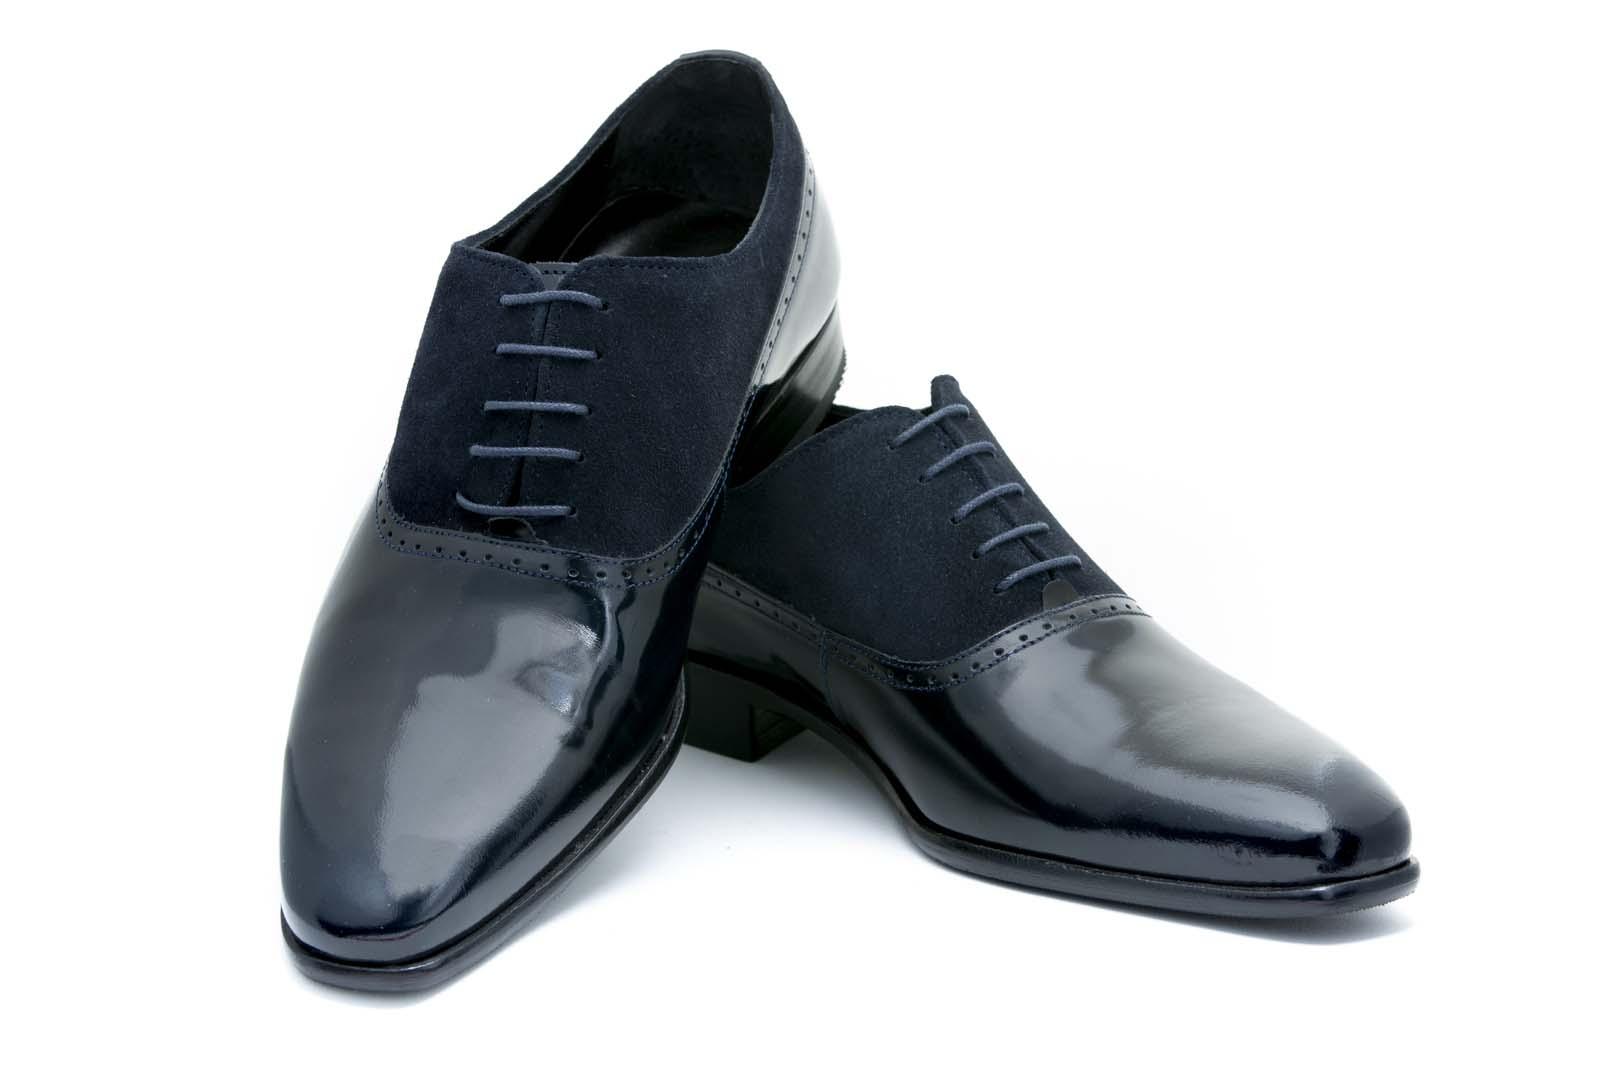 Zapato de novio modelo Oxford charol azul marino